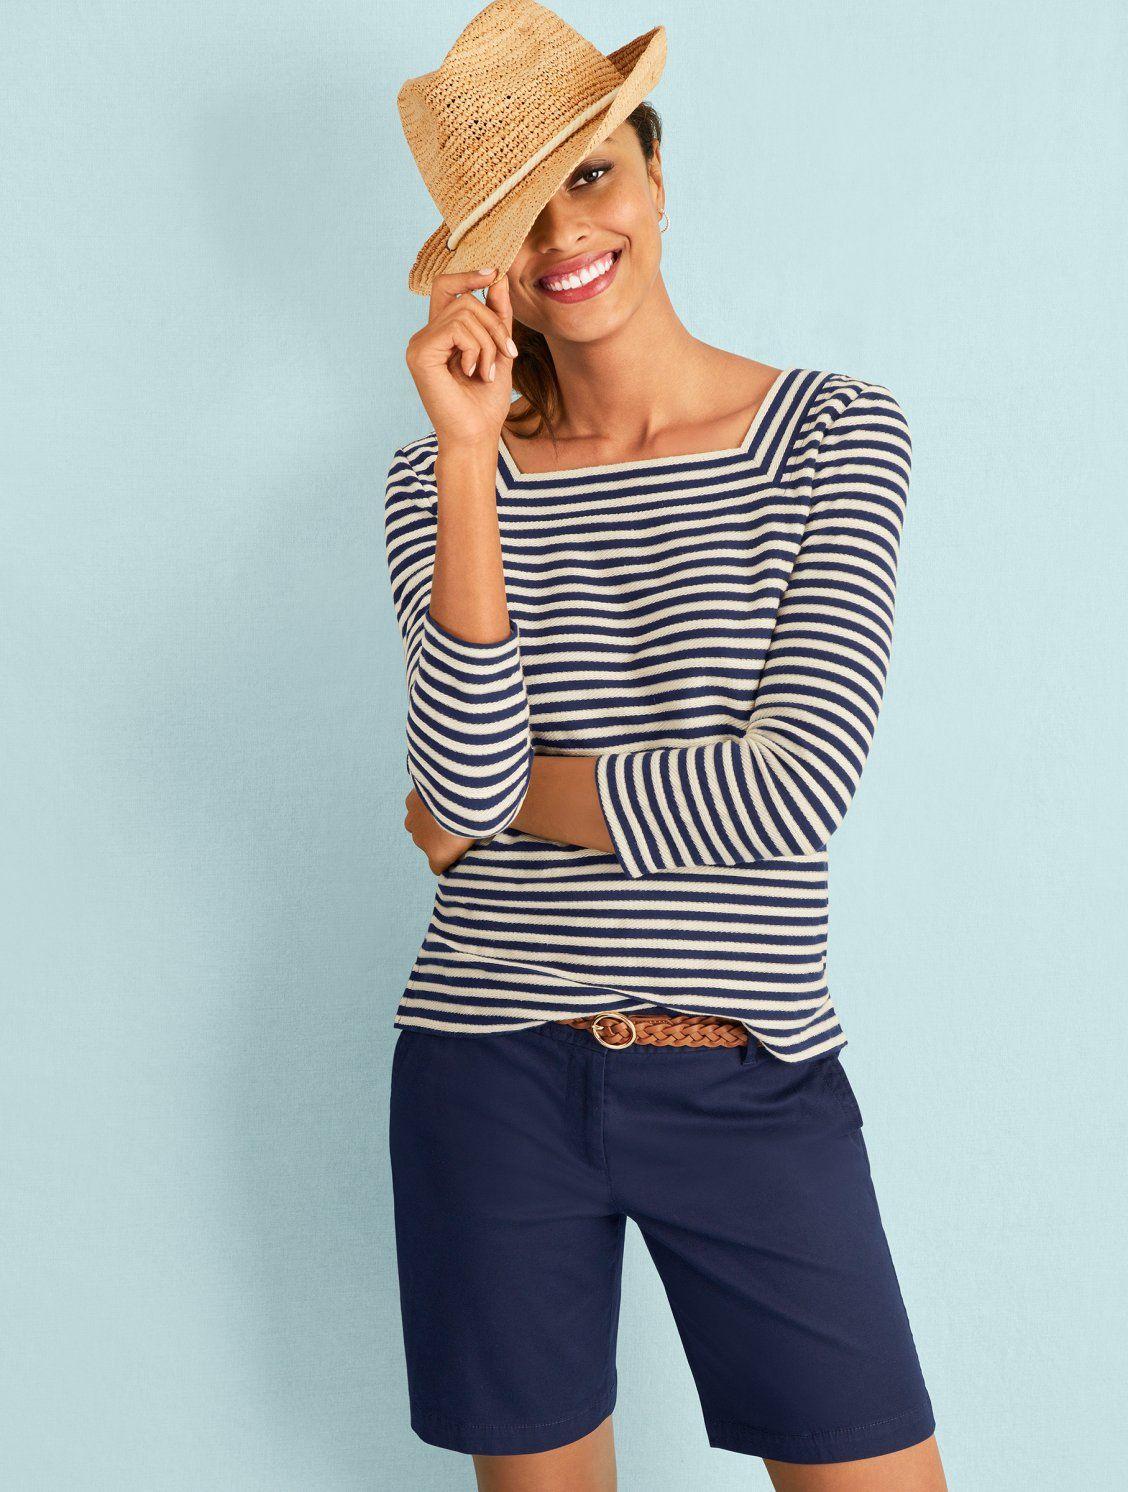 Perfect Shorts – Bermuda Length – Solid